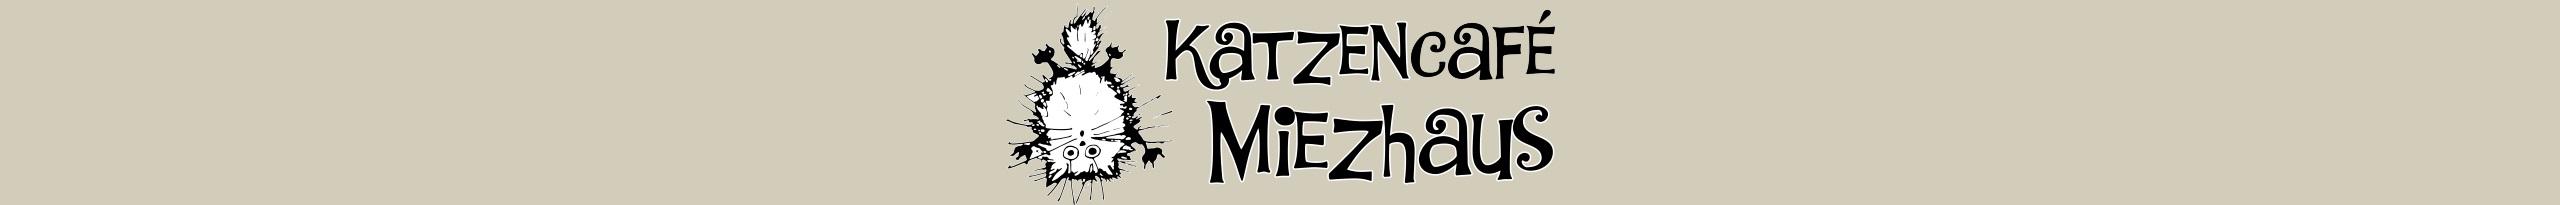 Katzencafé Miezhaus